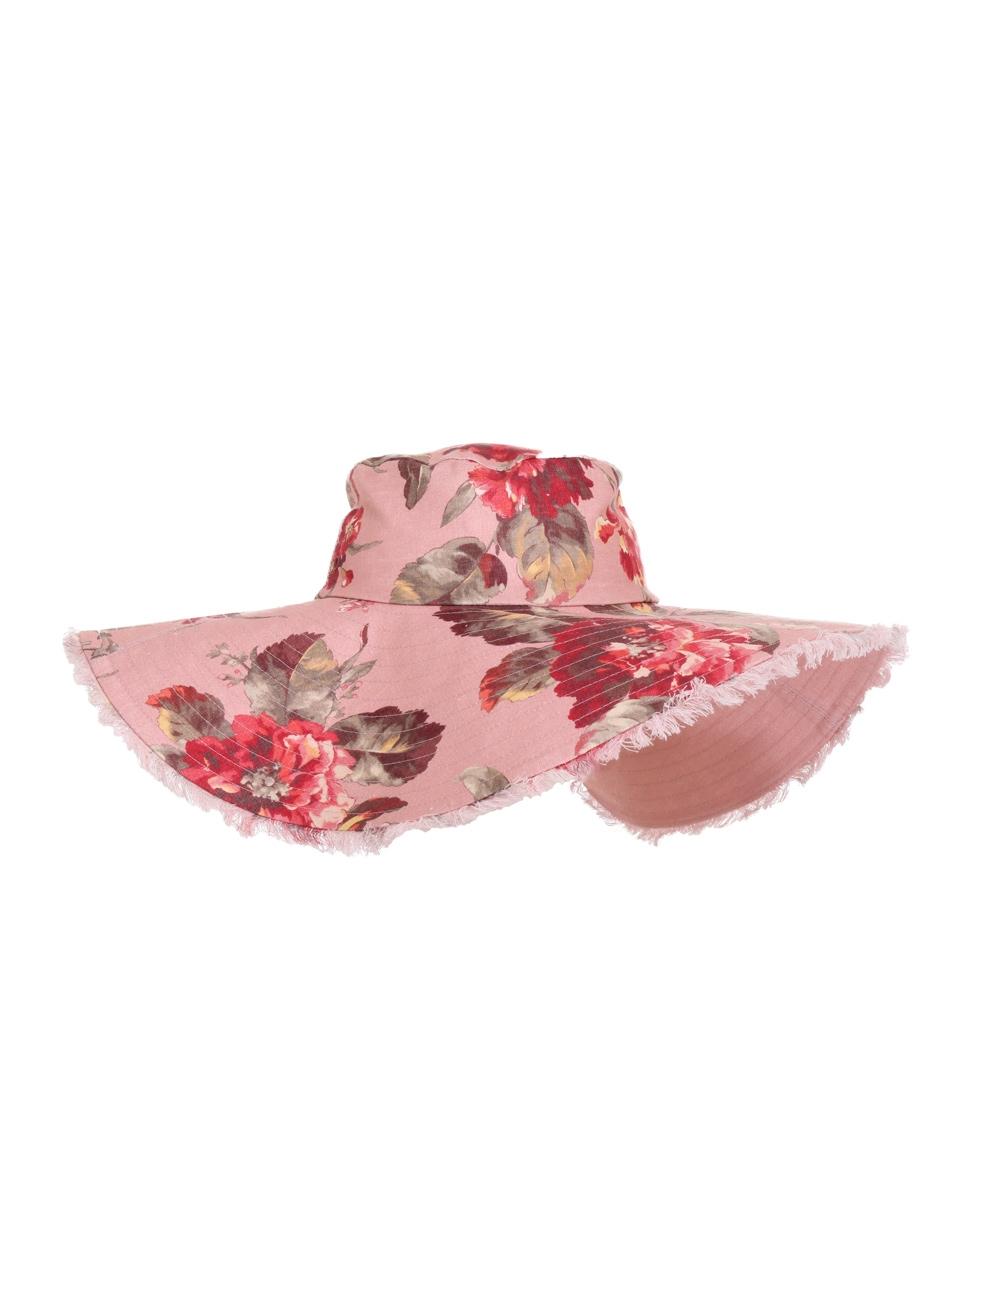 Reversible Frayed Floppy Hat